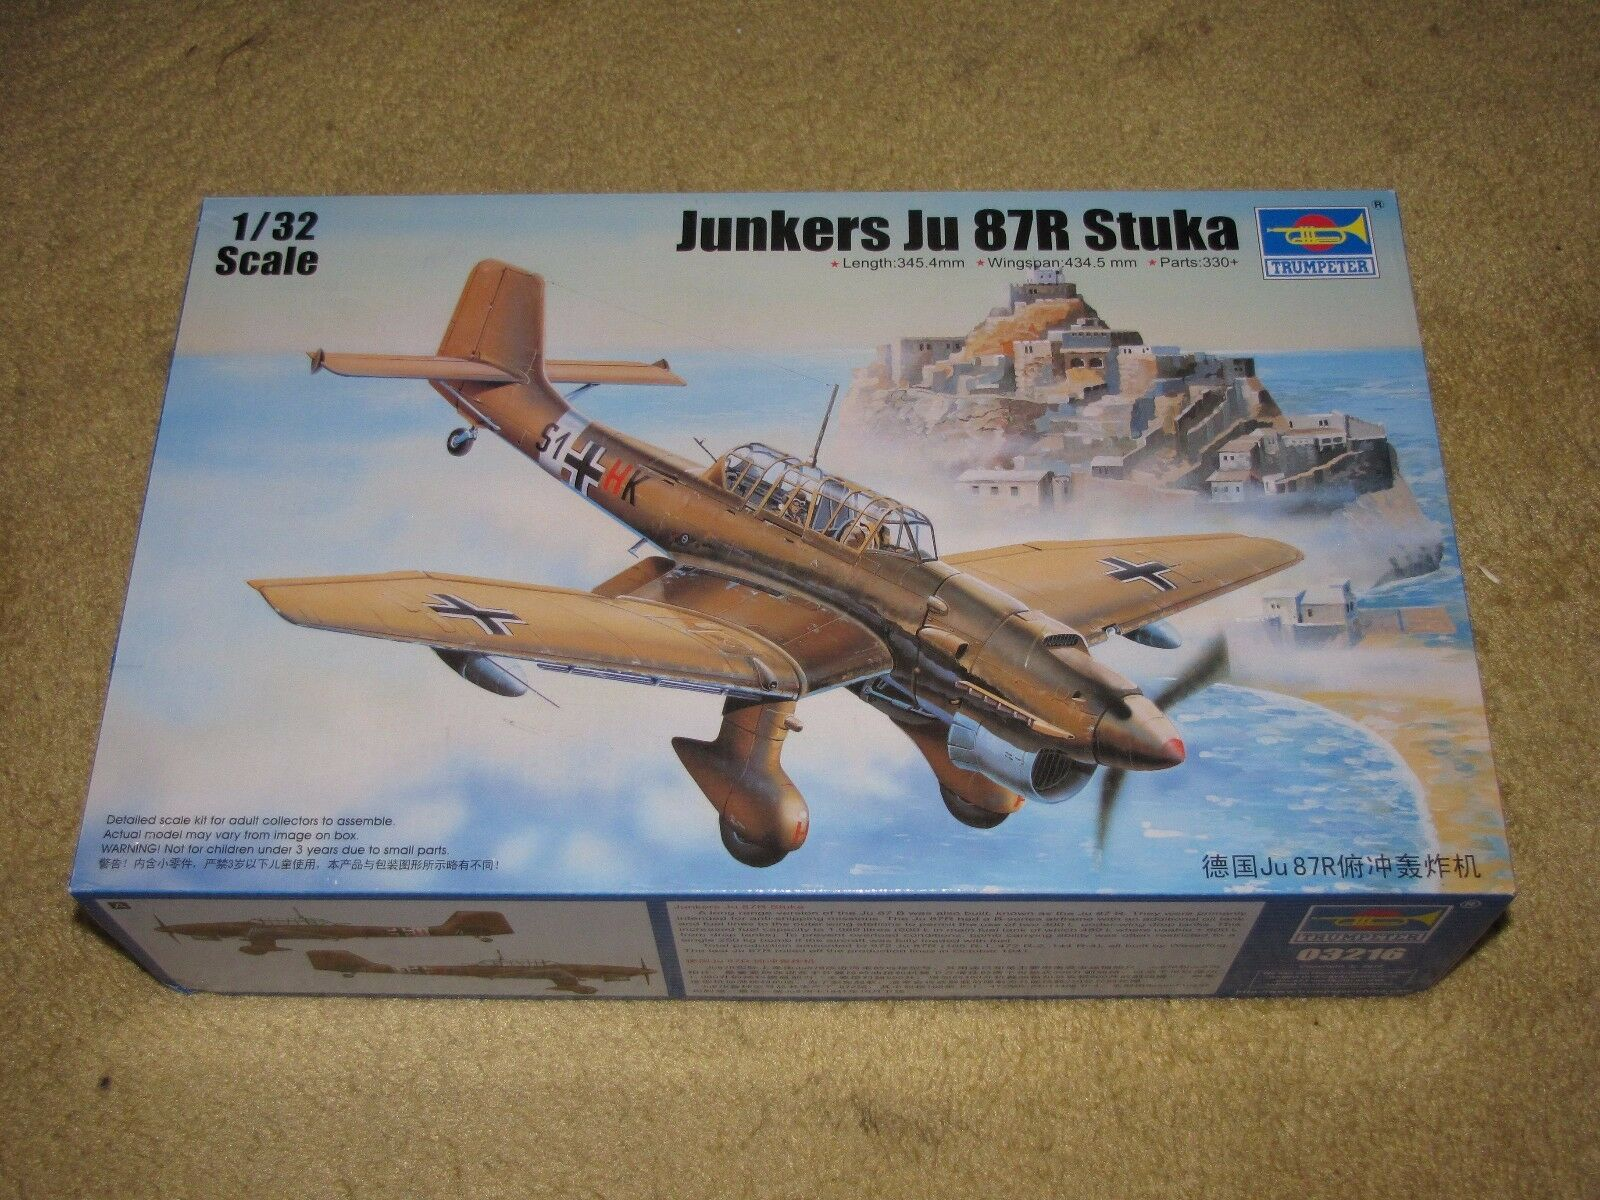 03216 1 32 Scale Junkers  Ju 87R Stuka Bomber Warcraft Plane Model Trumpeter  meilleure offre